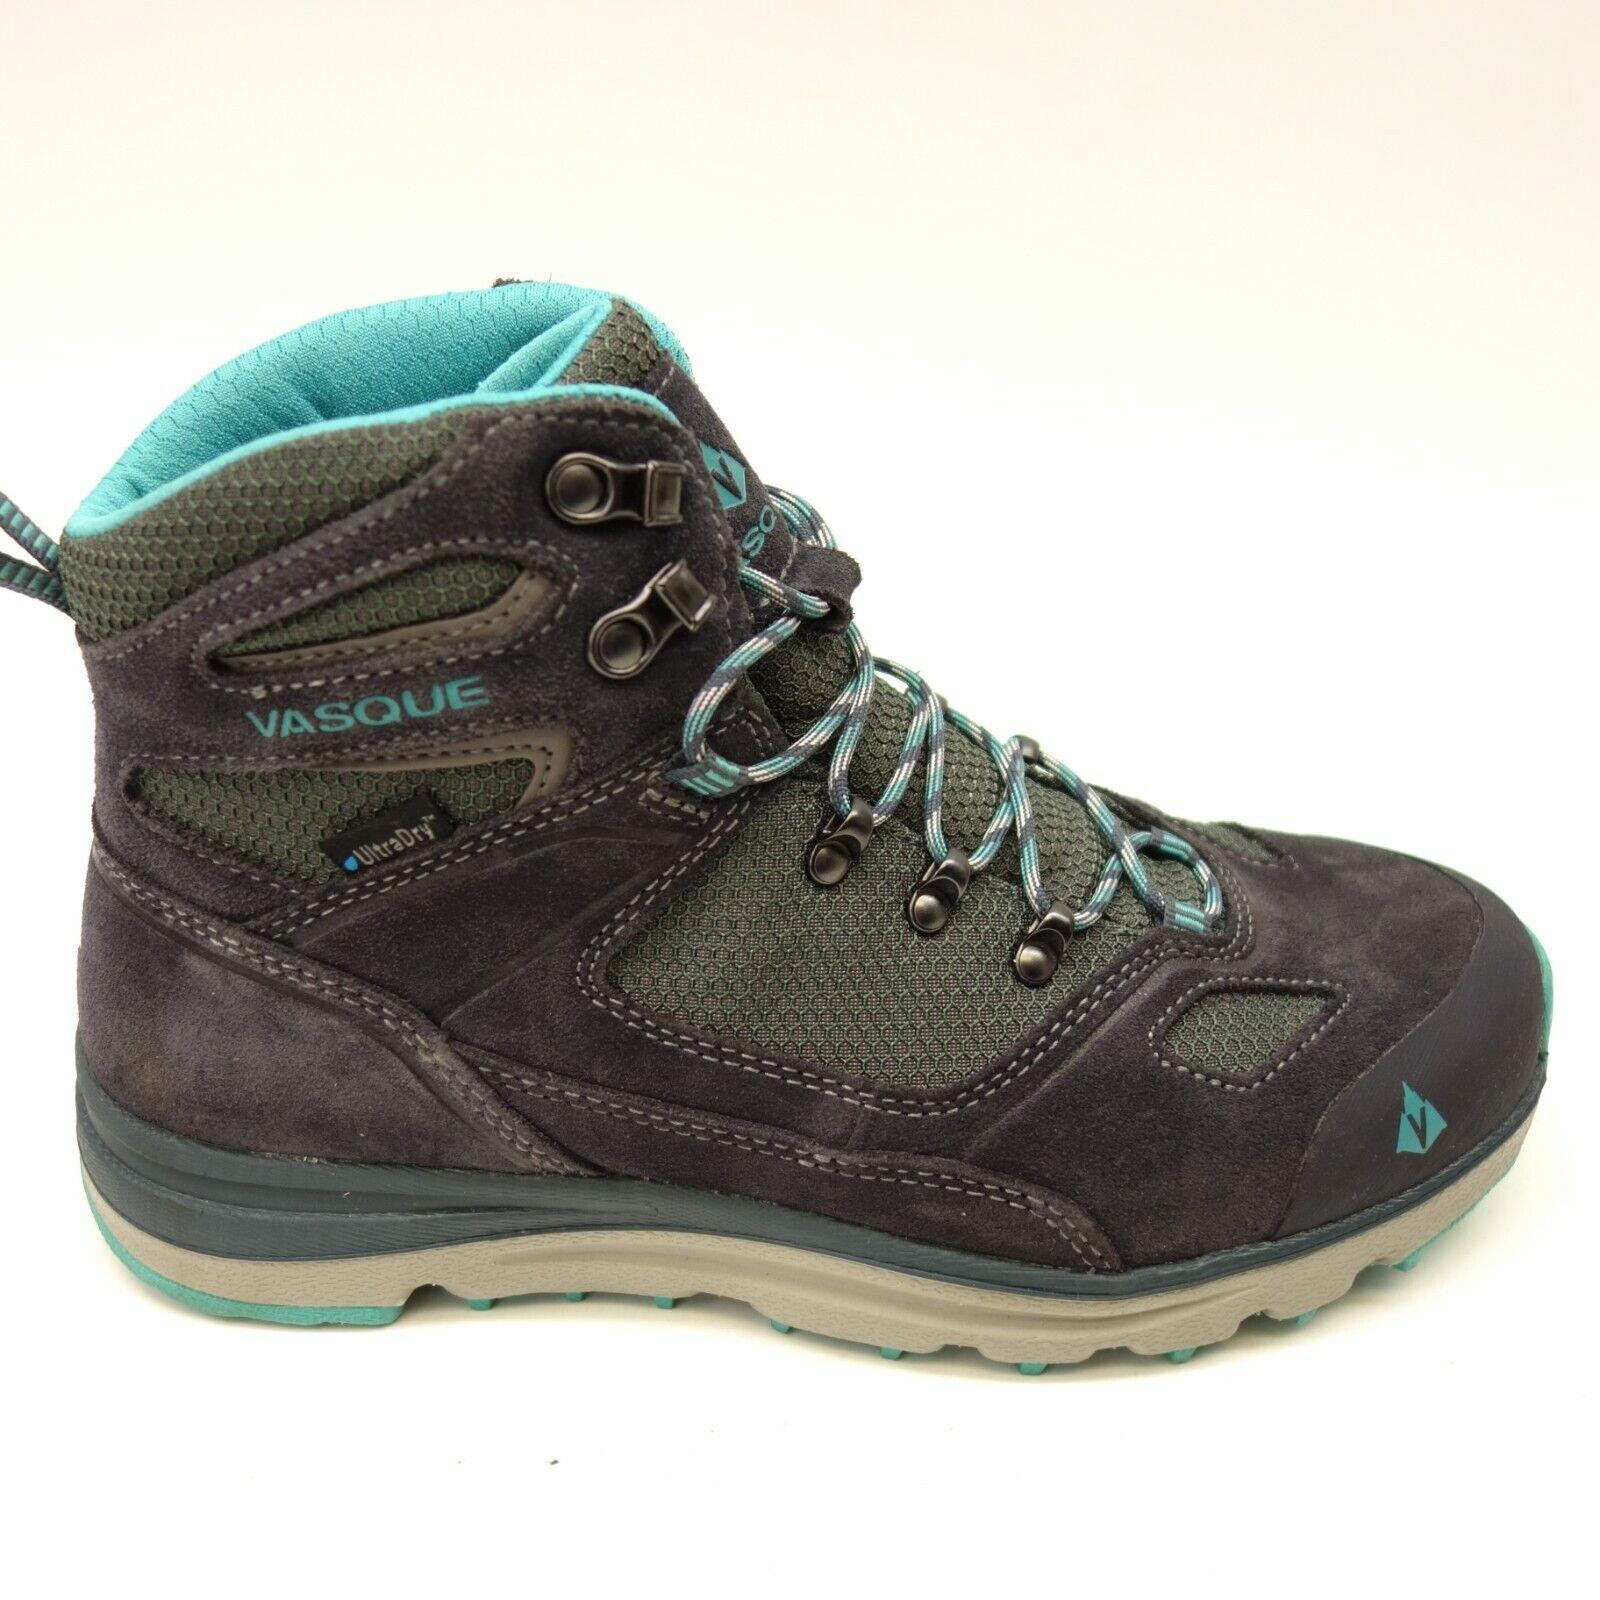 Vasque Womens Mesa Trek Ultradry Athletic Hiking Trail Outdoor Mid Boots Sz 8M